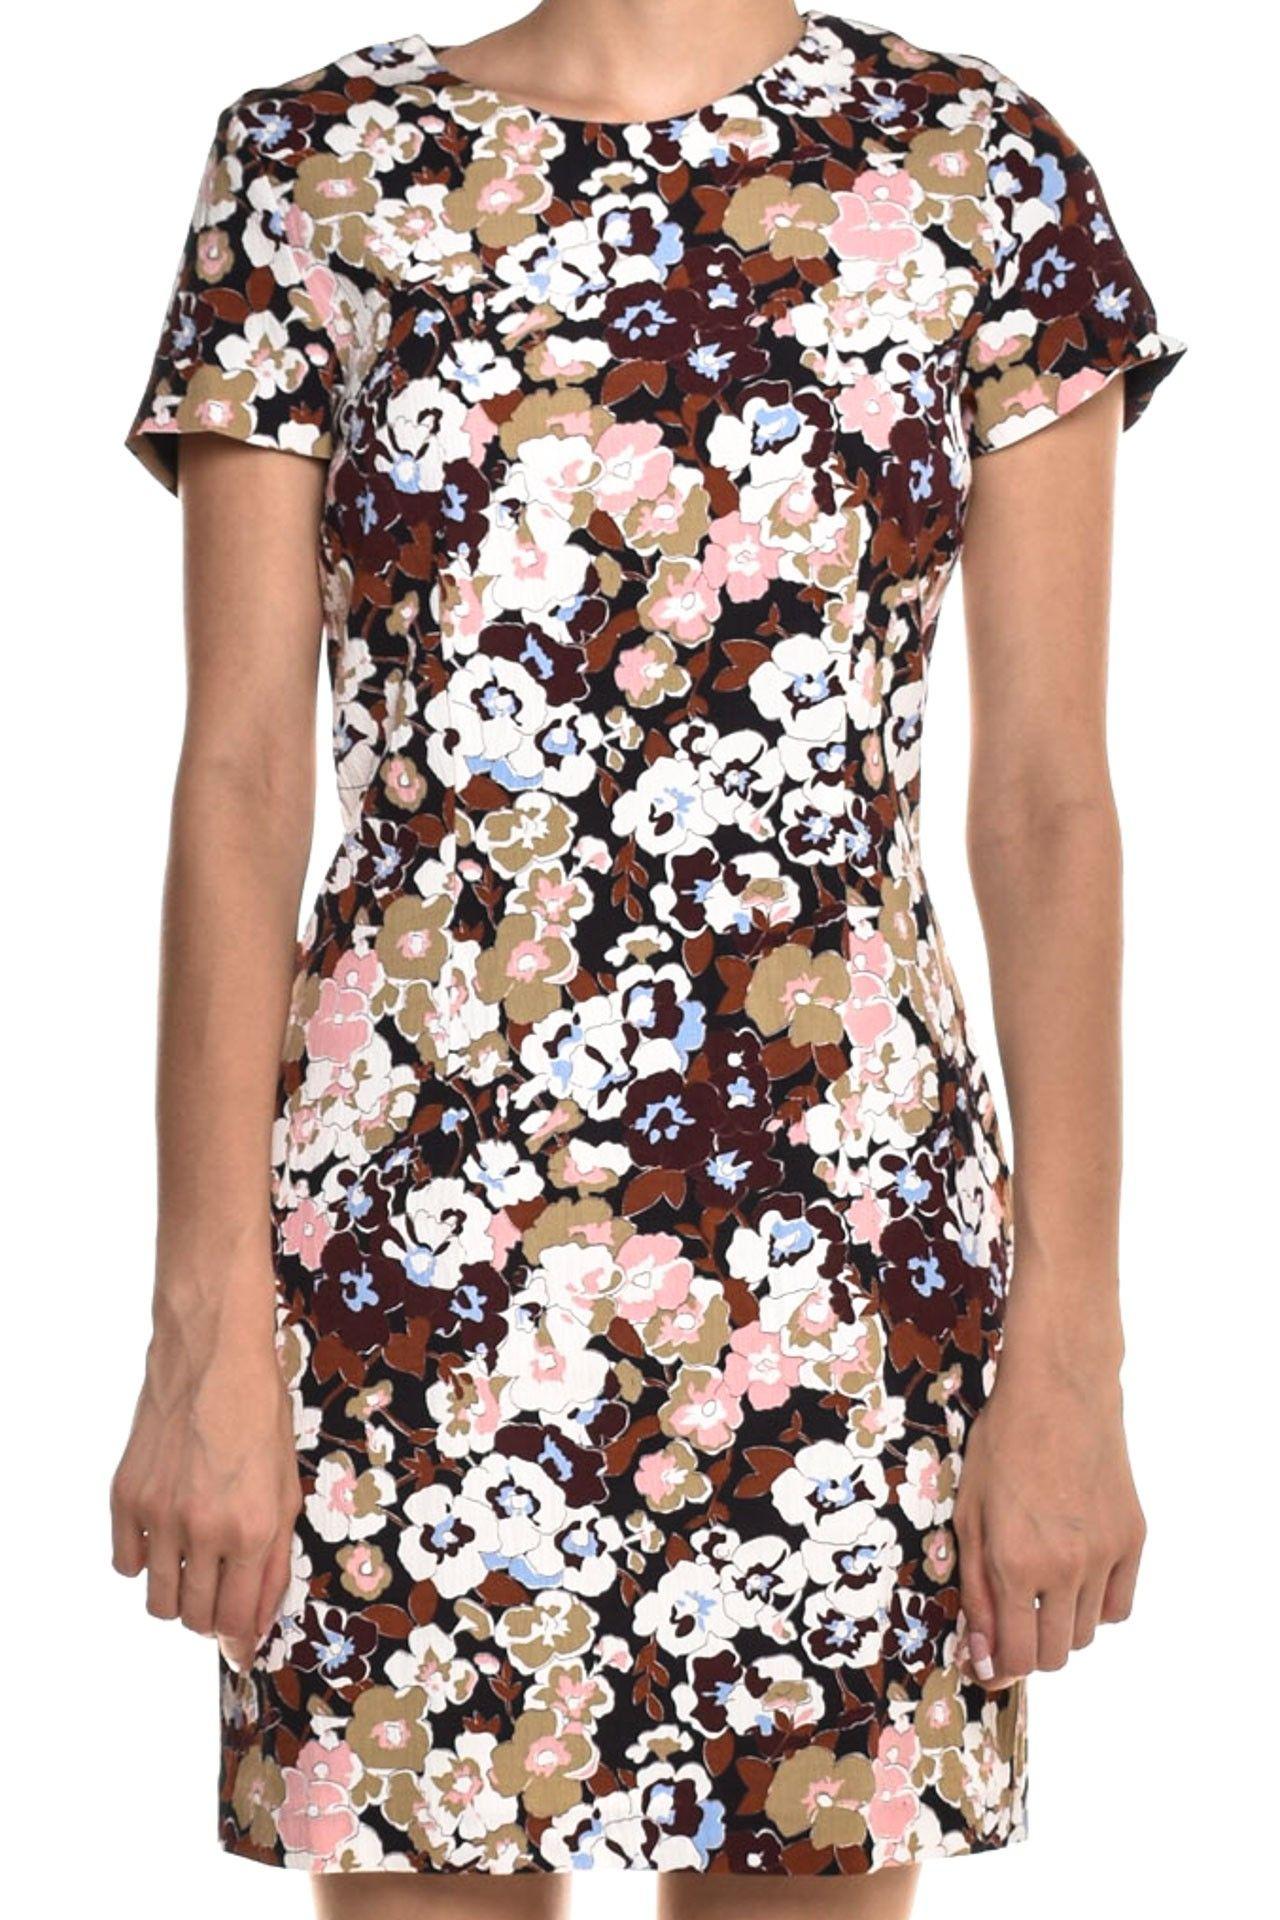 Gant - Vestido Floral Primavera - Foto 1